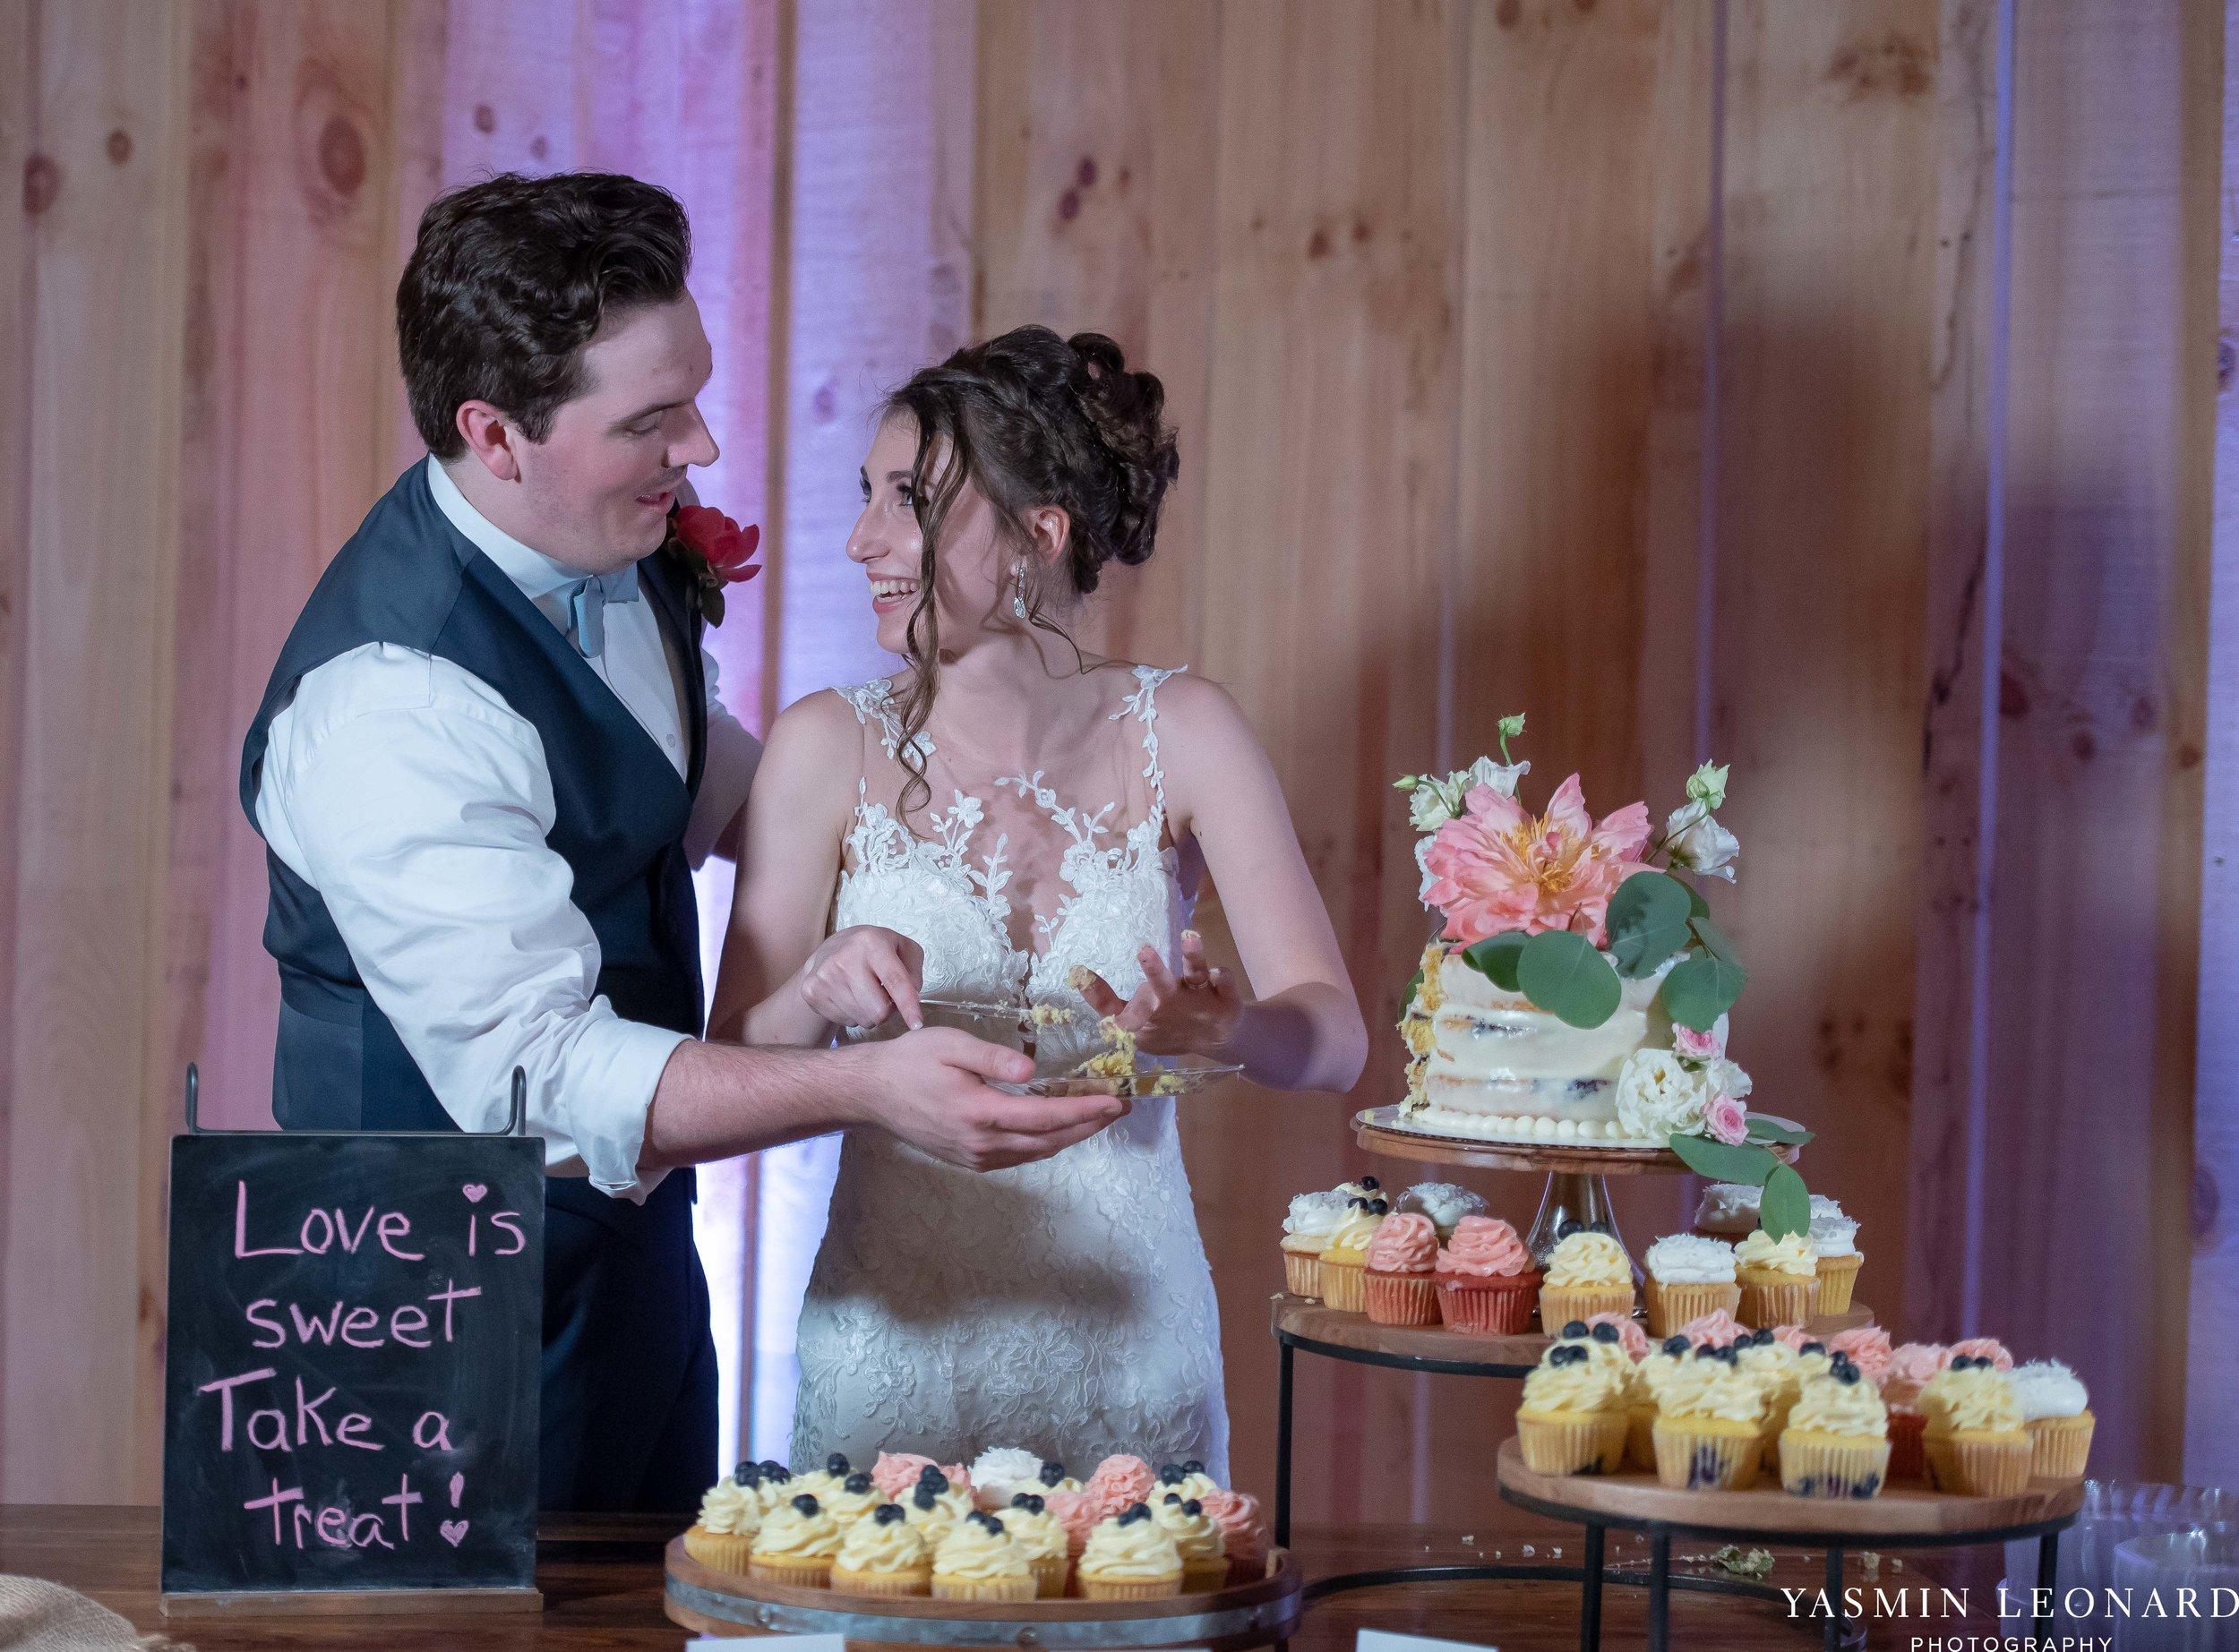 Old Homeplace Vineyard - NC Weddings - Outdoor Summer Weddings - Peony Boutique - Vineyard Wedding - NC Photographer - Yasmin Leonard Photography-65.jpg